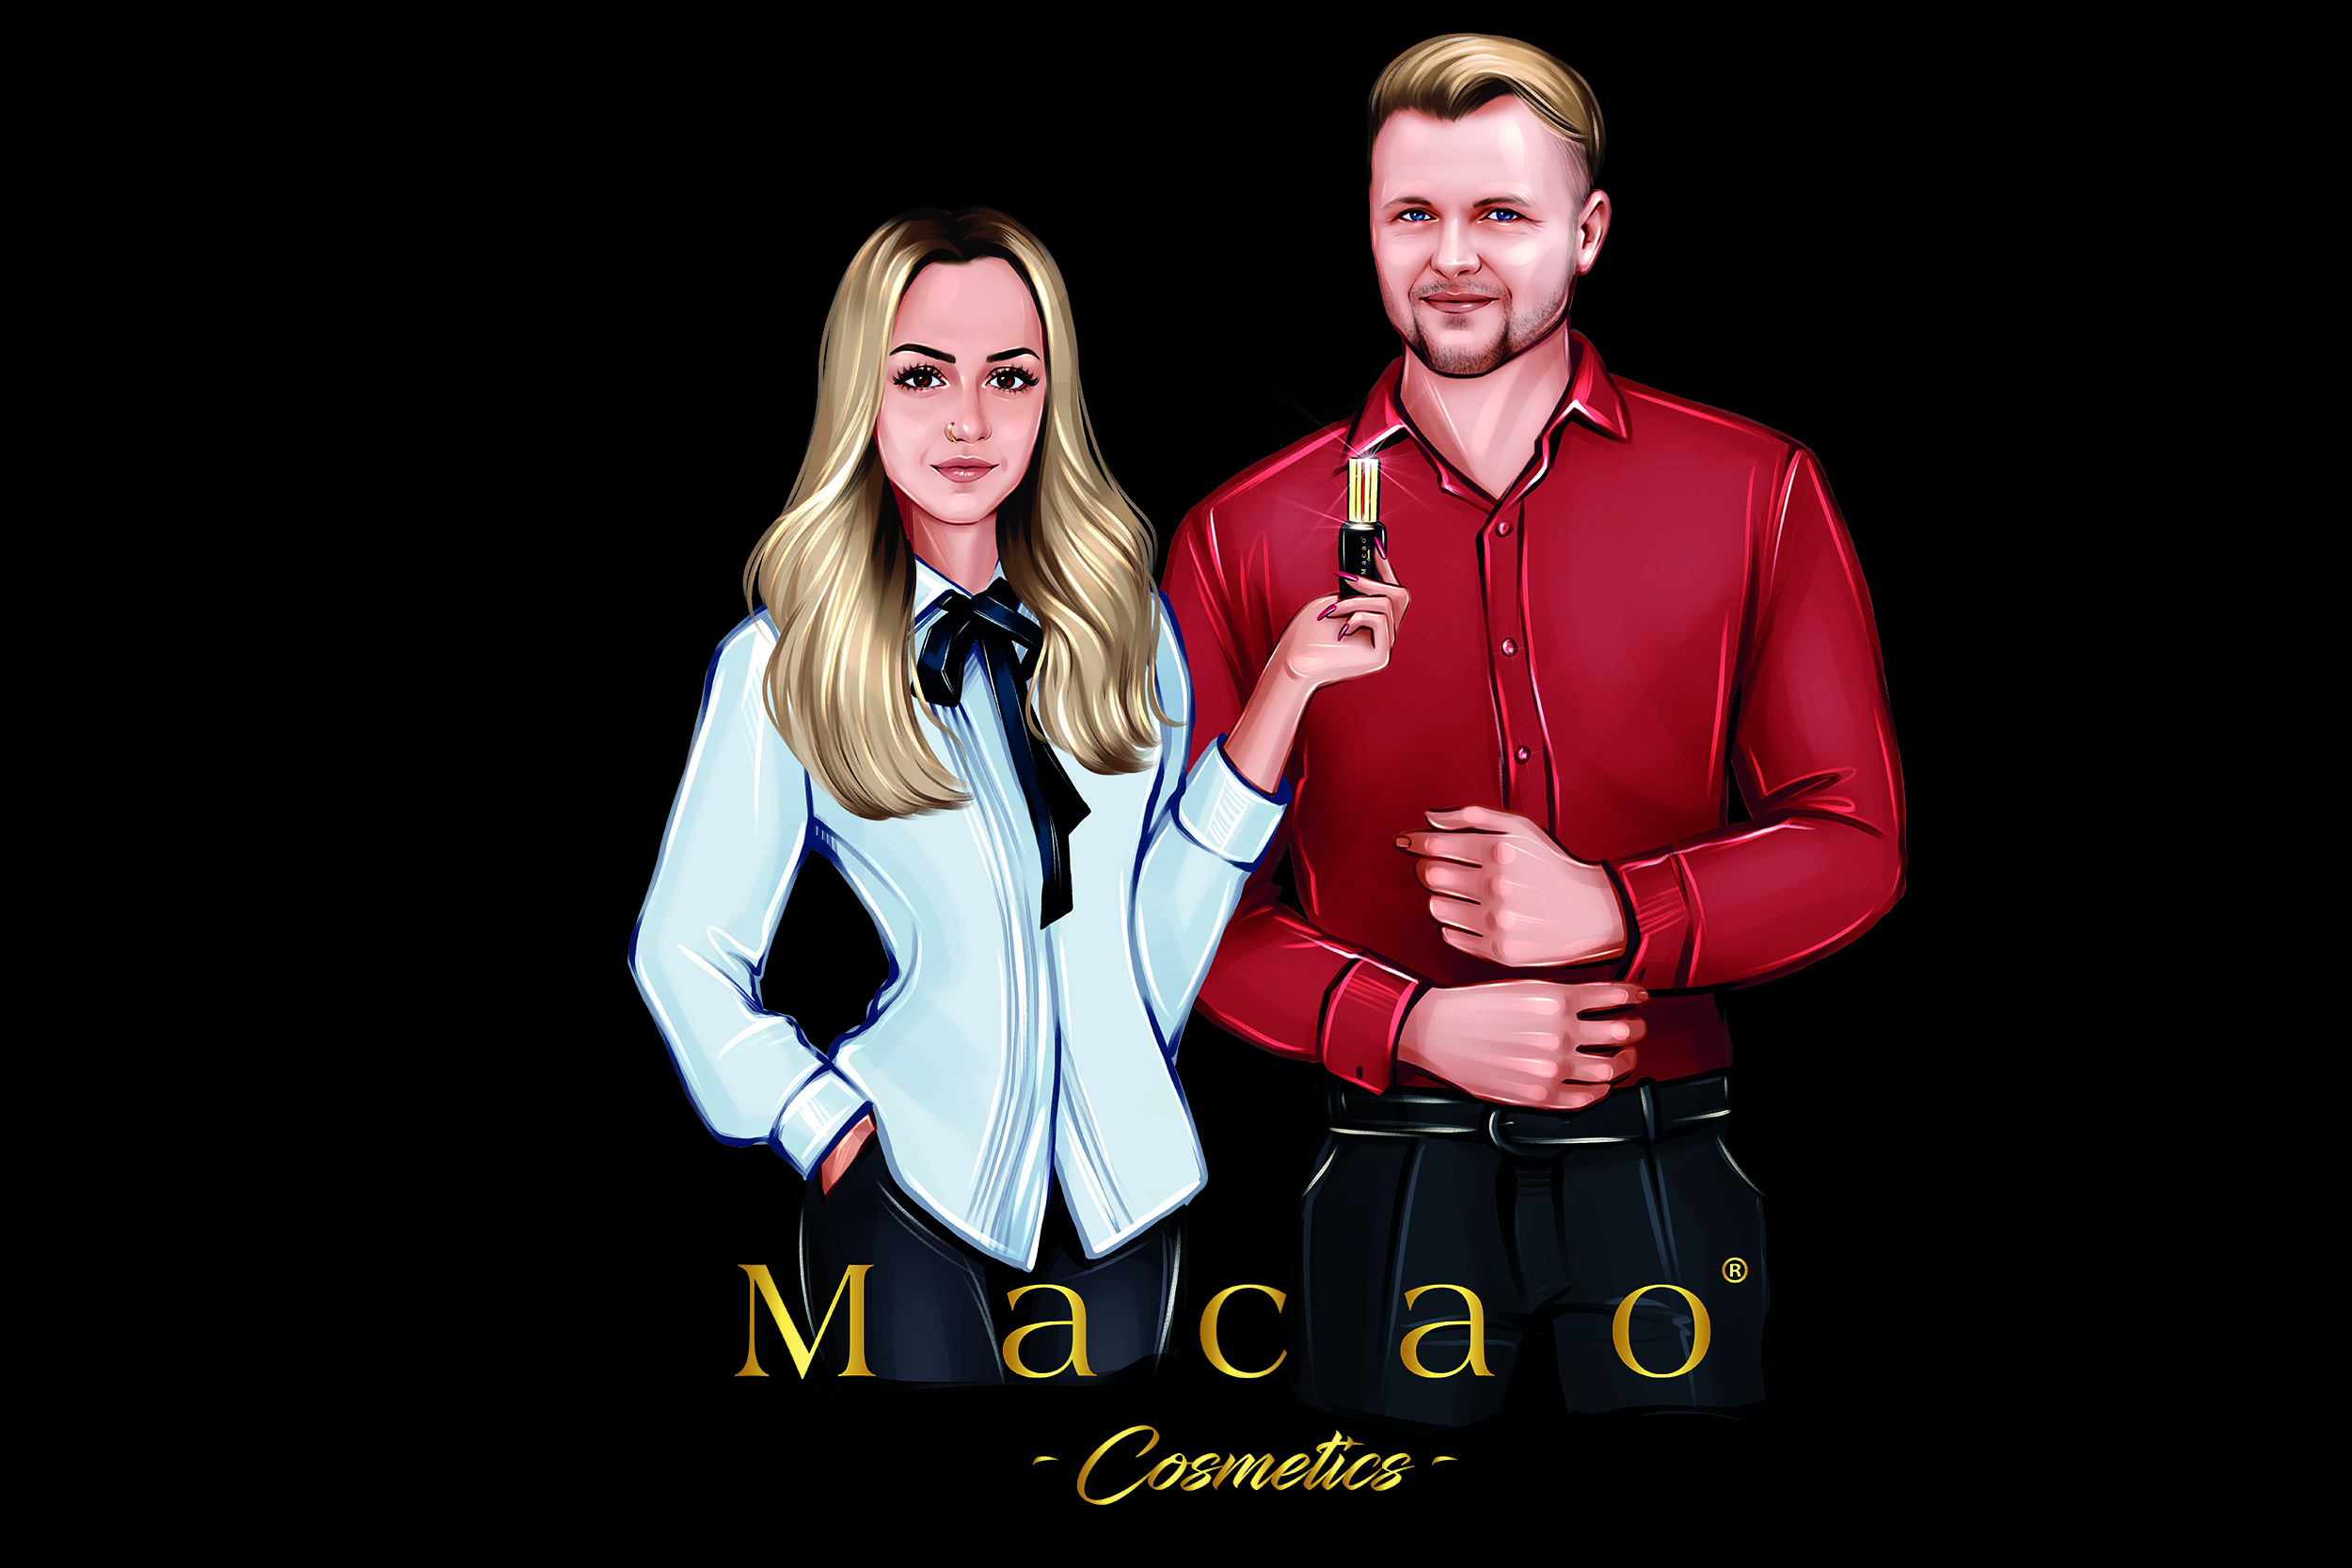 MacaoCosmetics